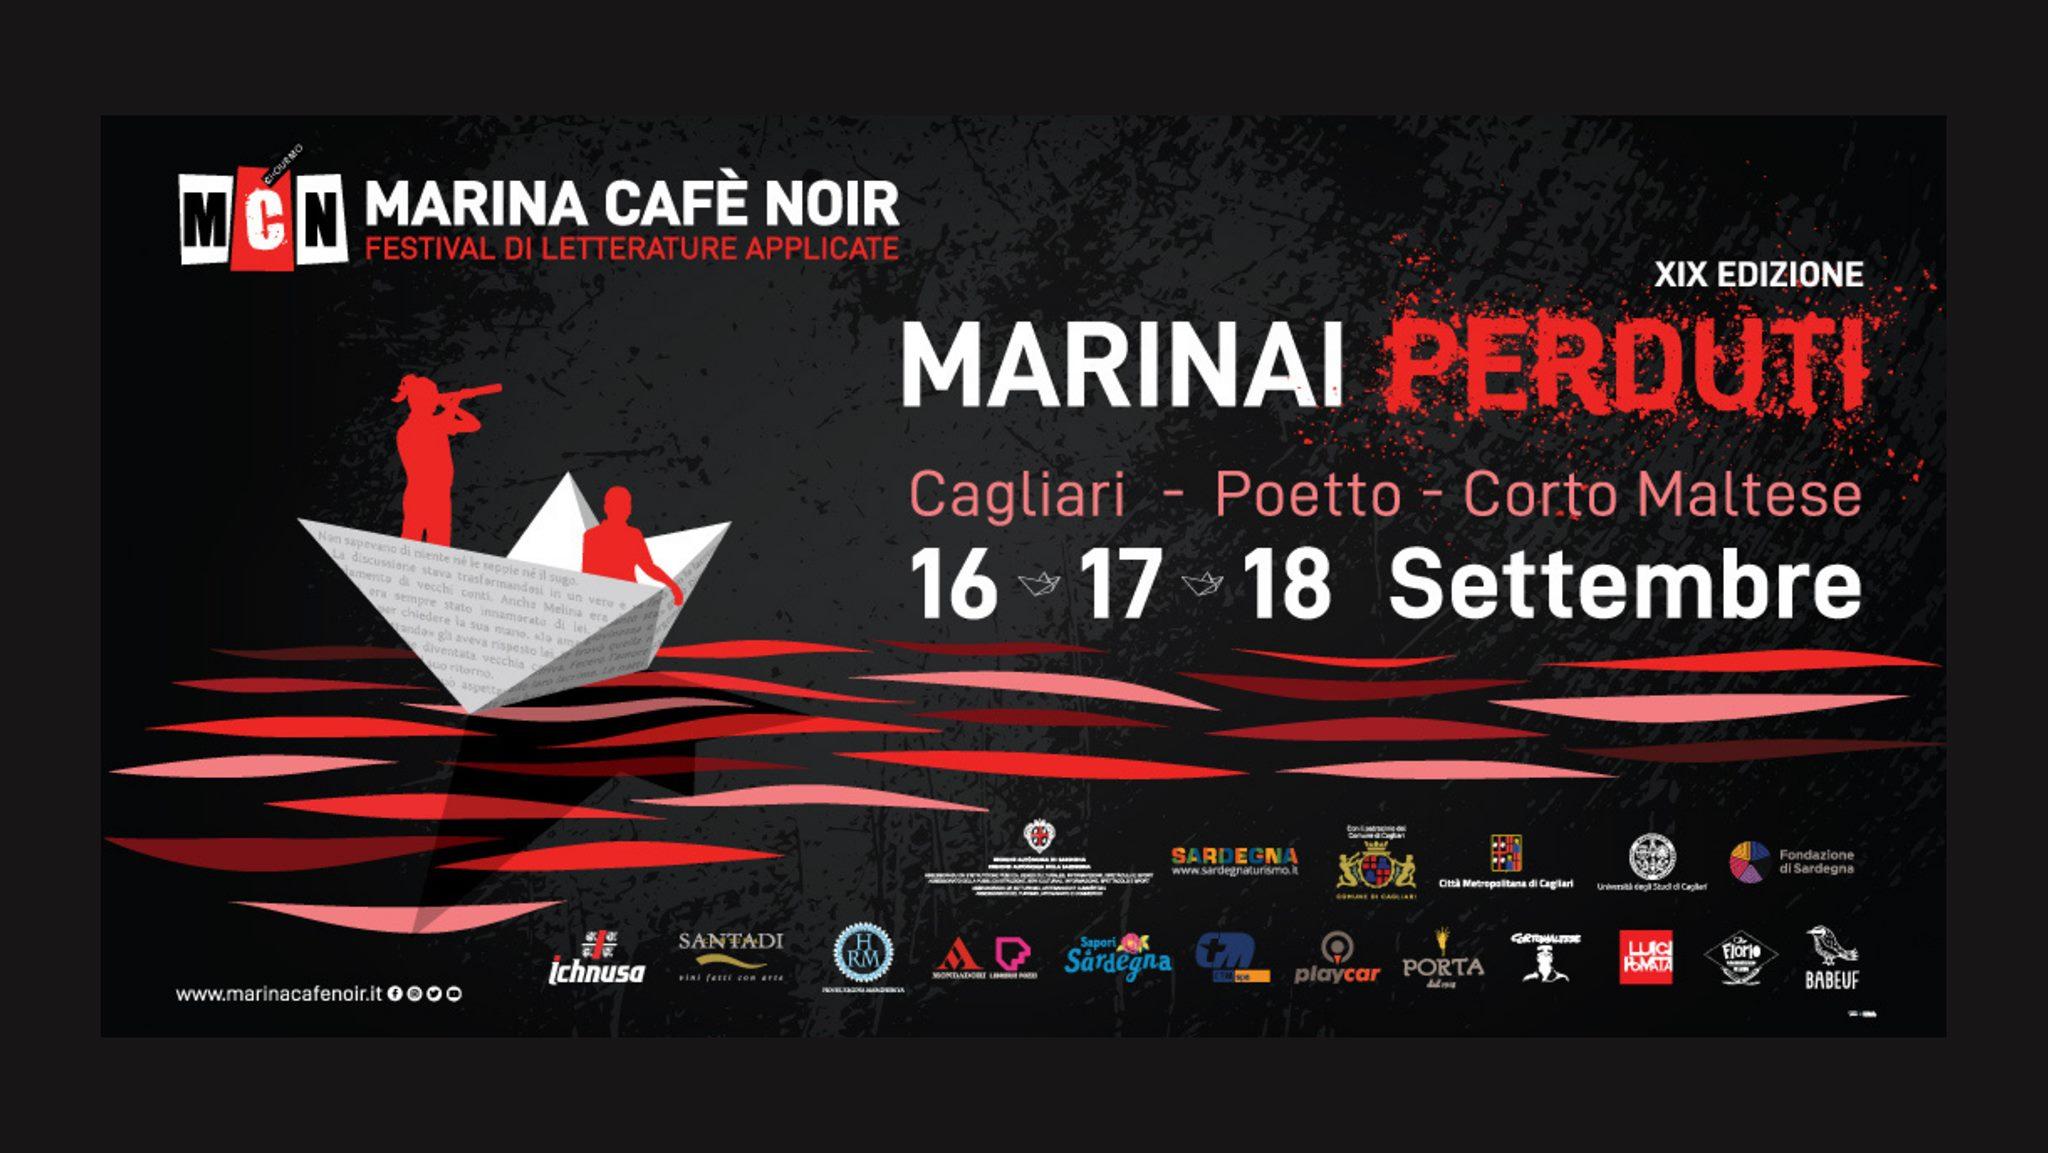 MARINA CAFE NOIR 2021